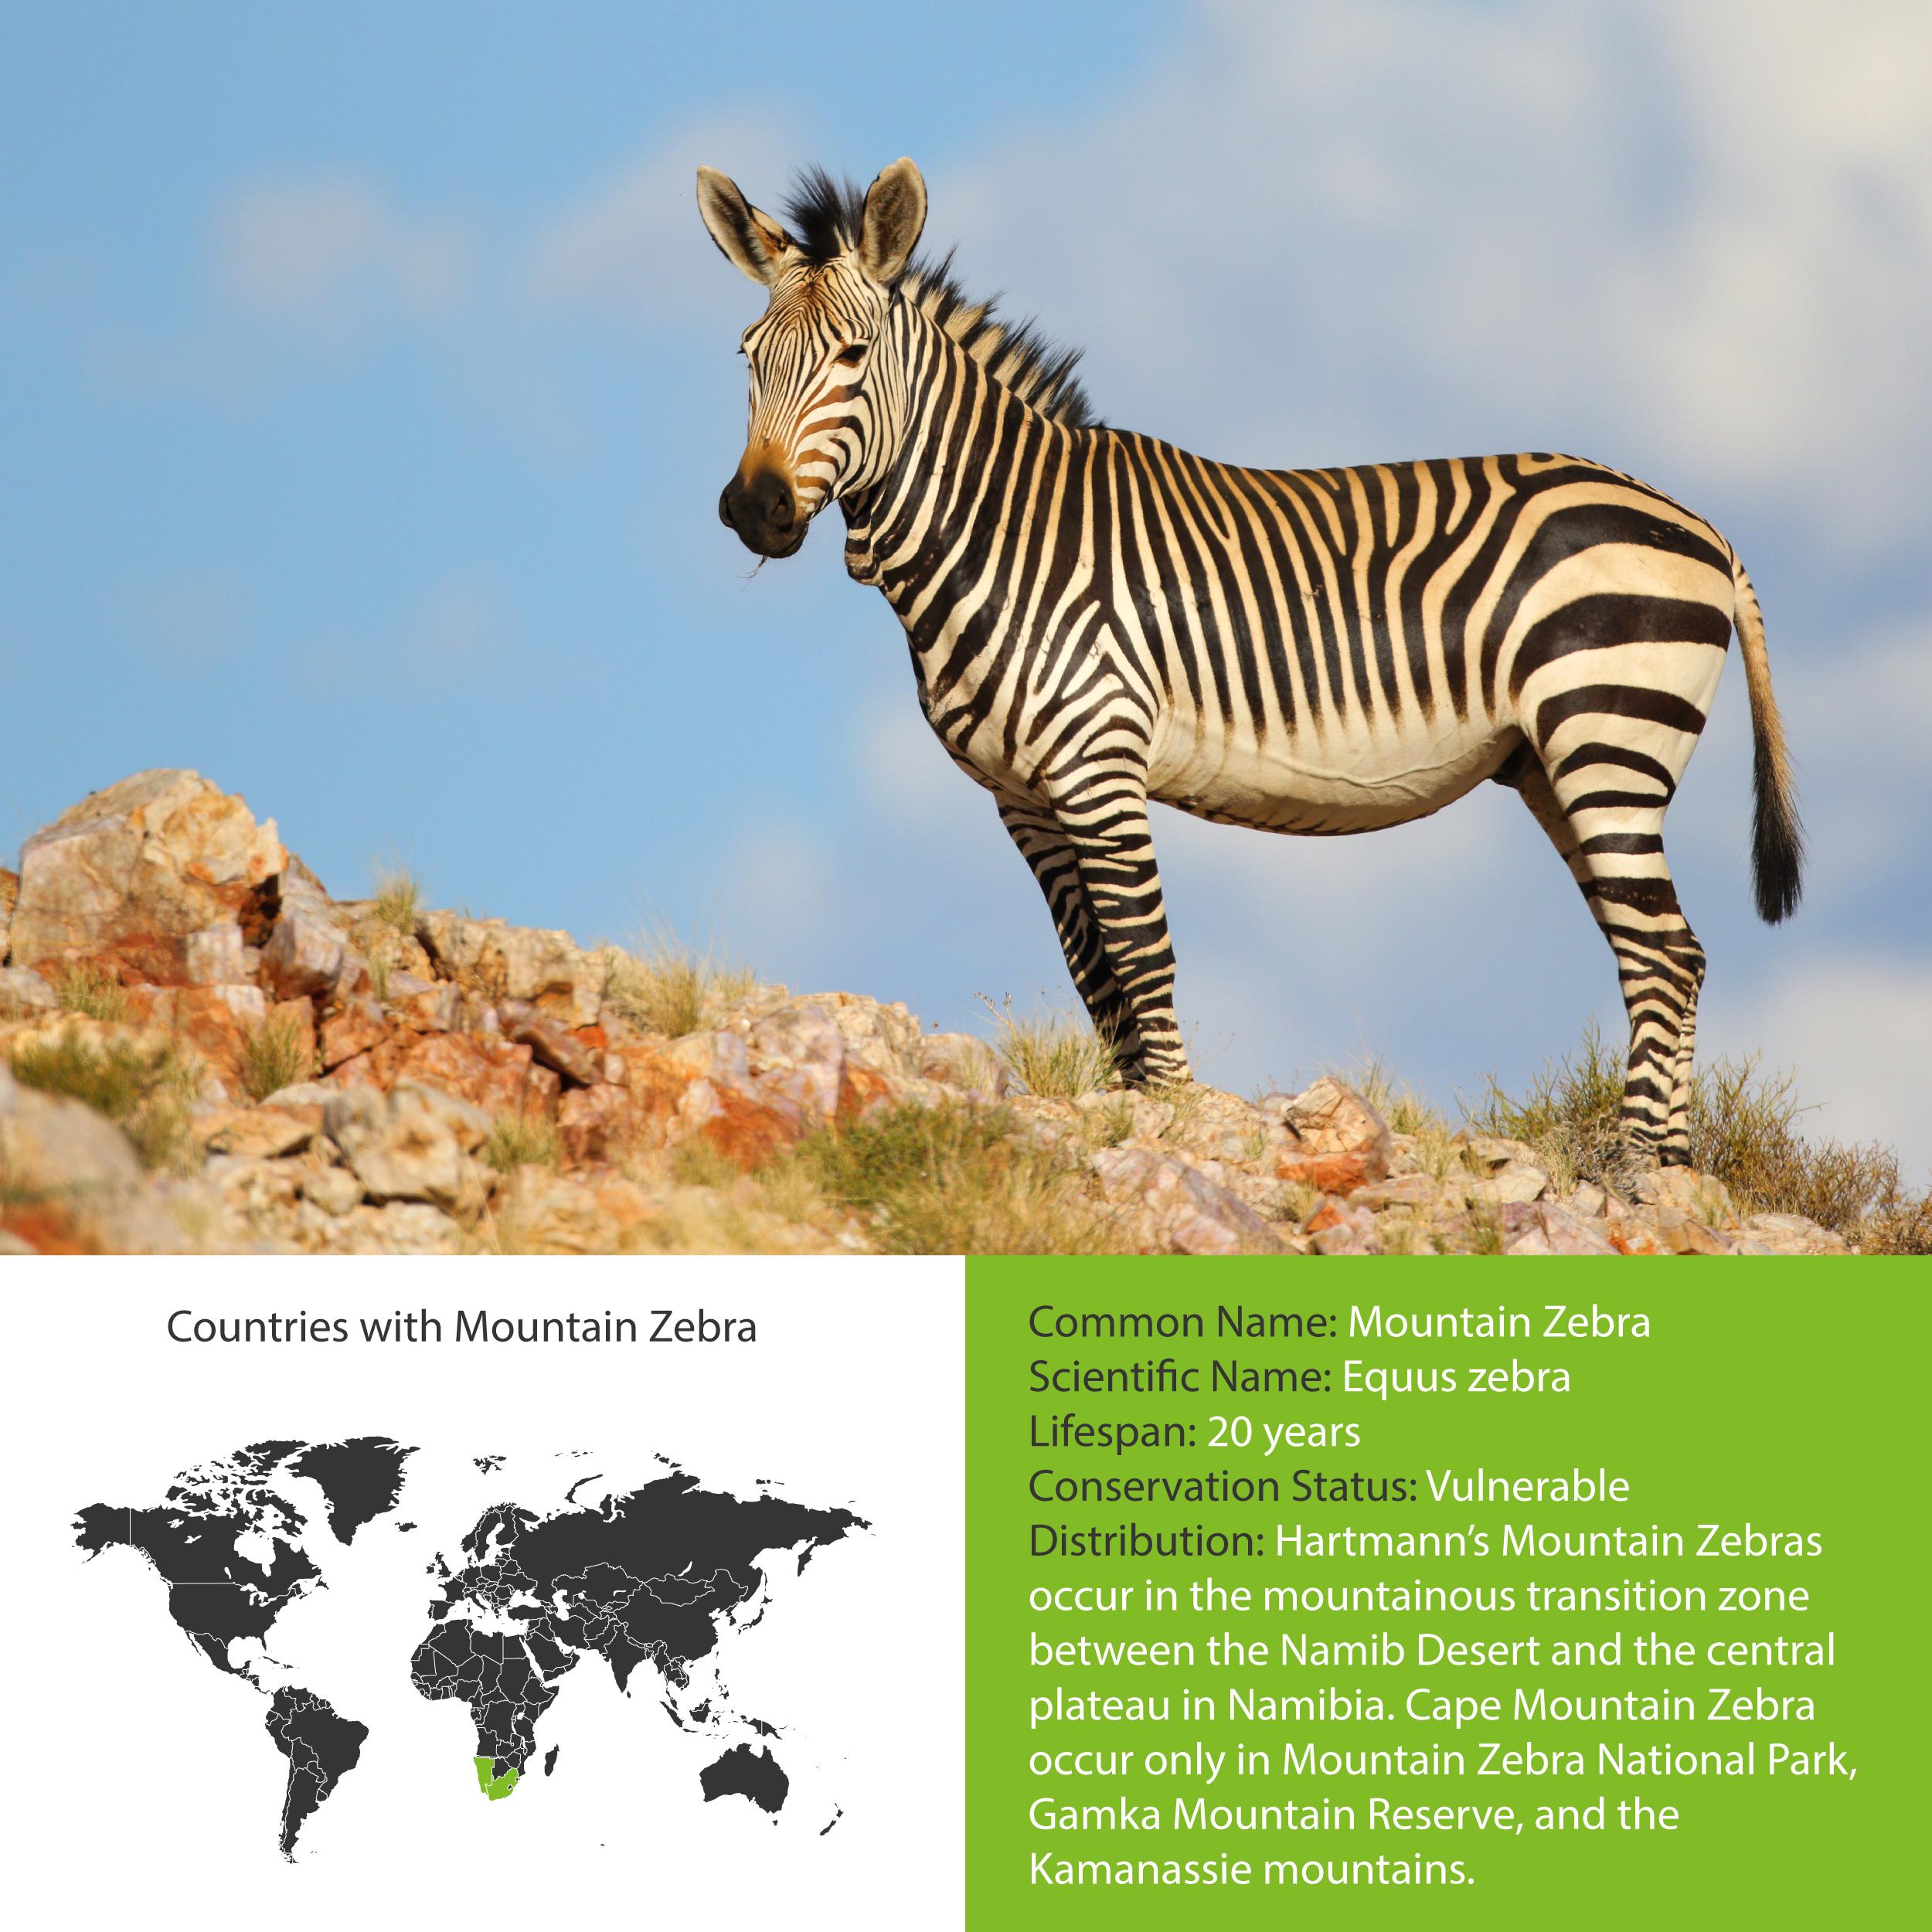 Mountain Zebra Distribution